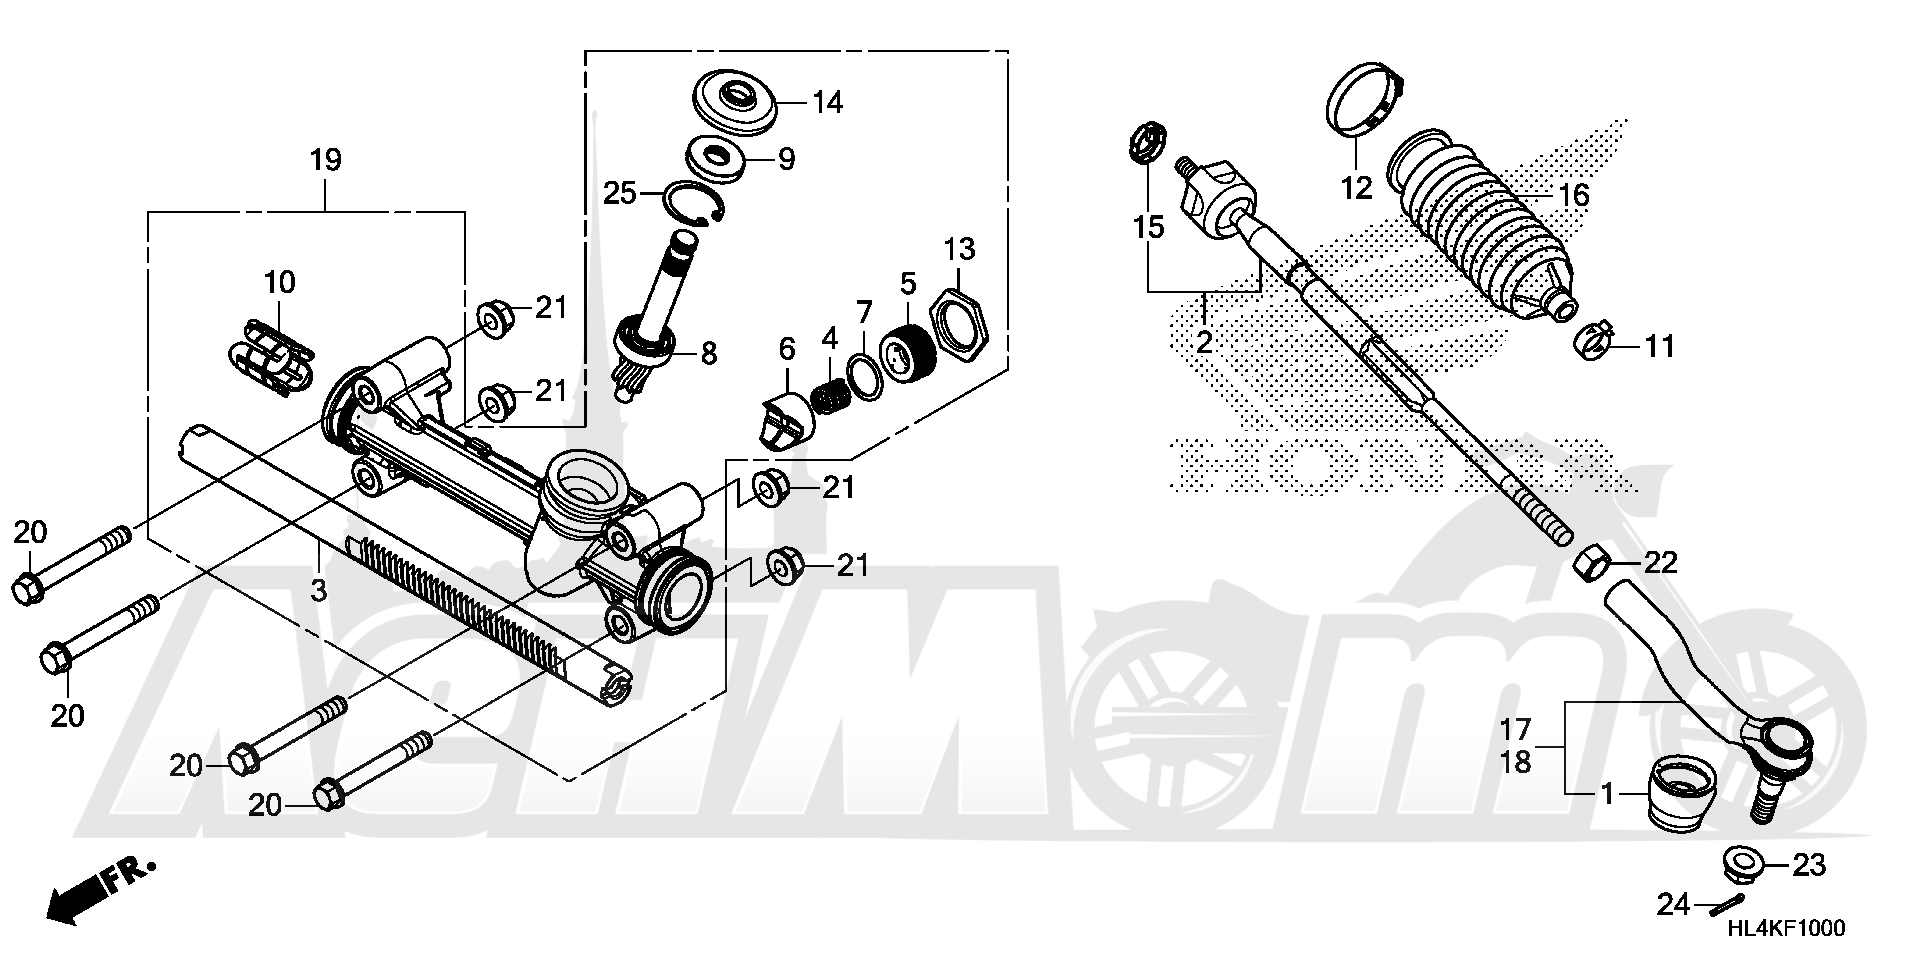 Запчасти для Квадроцикла Honda 2019 SXS1000M5D Раздел: STEERING GEAR BOX AND TIE ROD | рулевое управление коробка передач и рулевая тяга